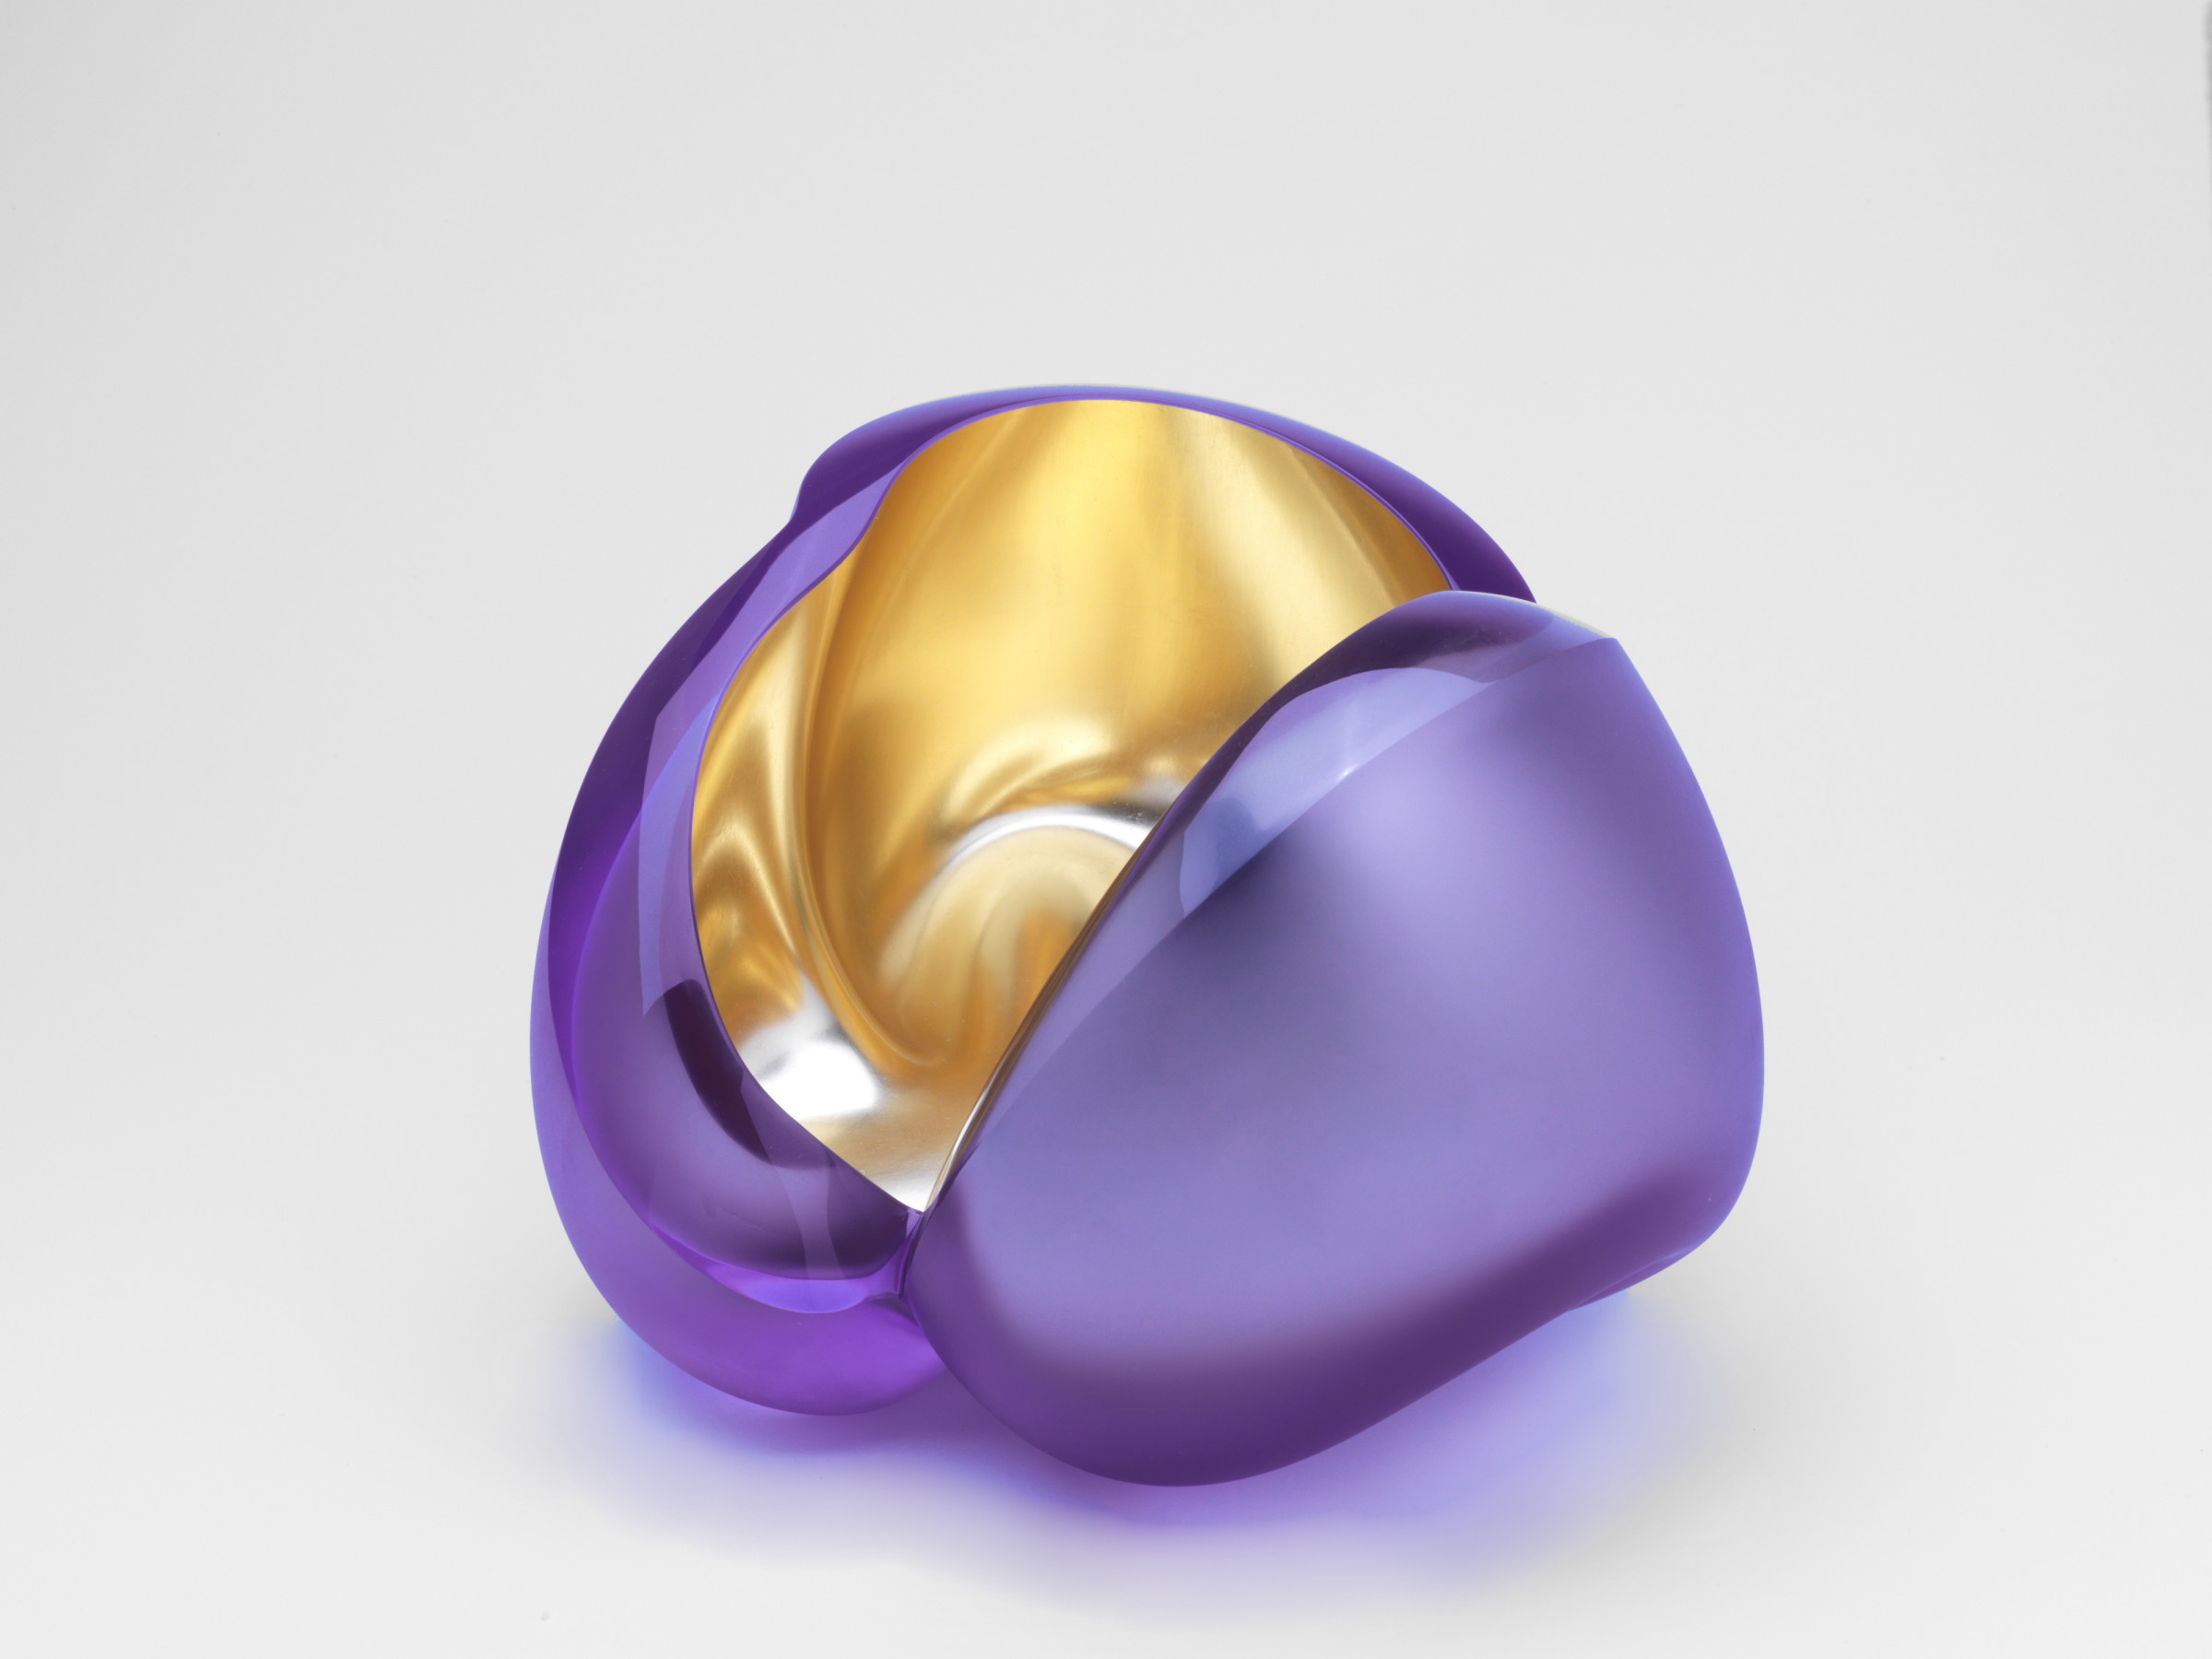 <span class=&#34;link fancybox-details-link&#34;><a href=&#34;/exhibitions/23/works/artworks5490/&#34;>View Detail Page</a></span><div class=&#34;medium&#34;>Handblown Glass and 23,5 KR orange gold</div> <div class=&#34;dimensions&#34;>19 x 28 x 32 cm</div>